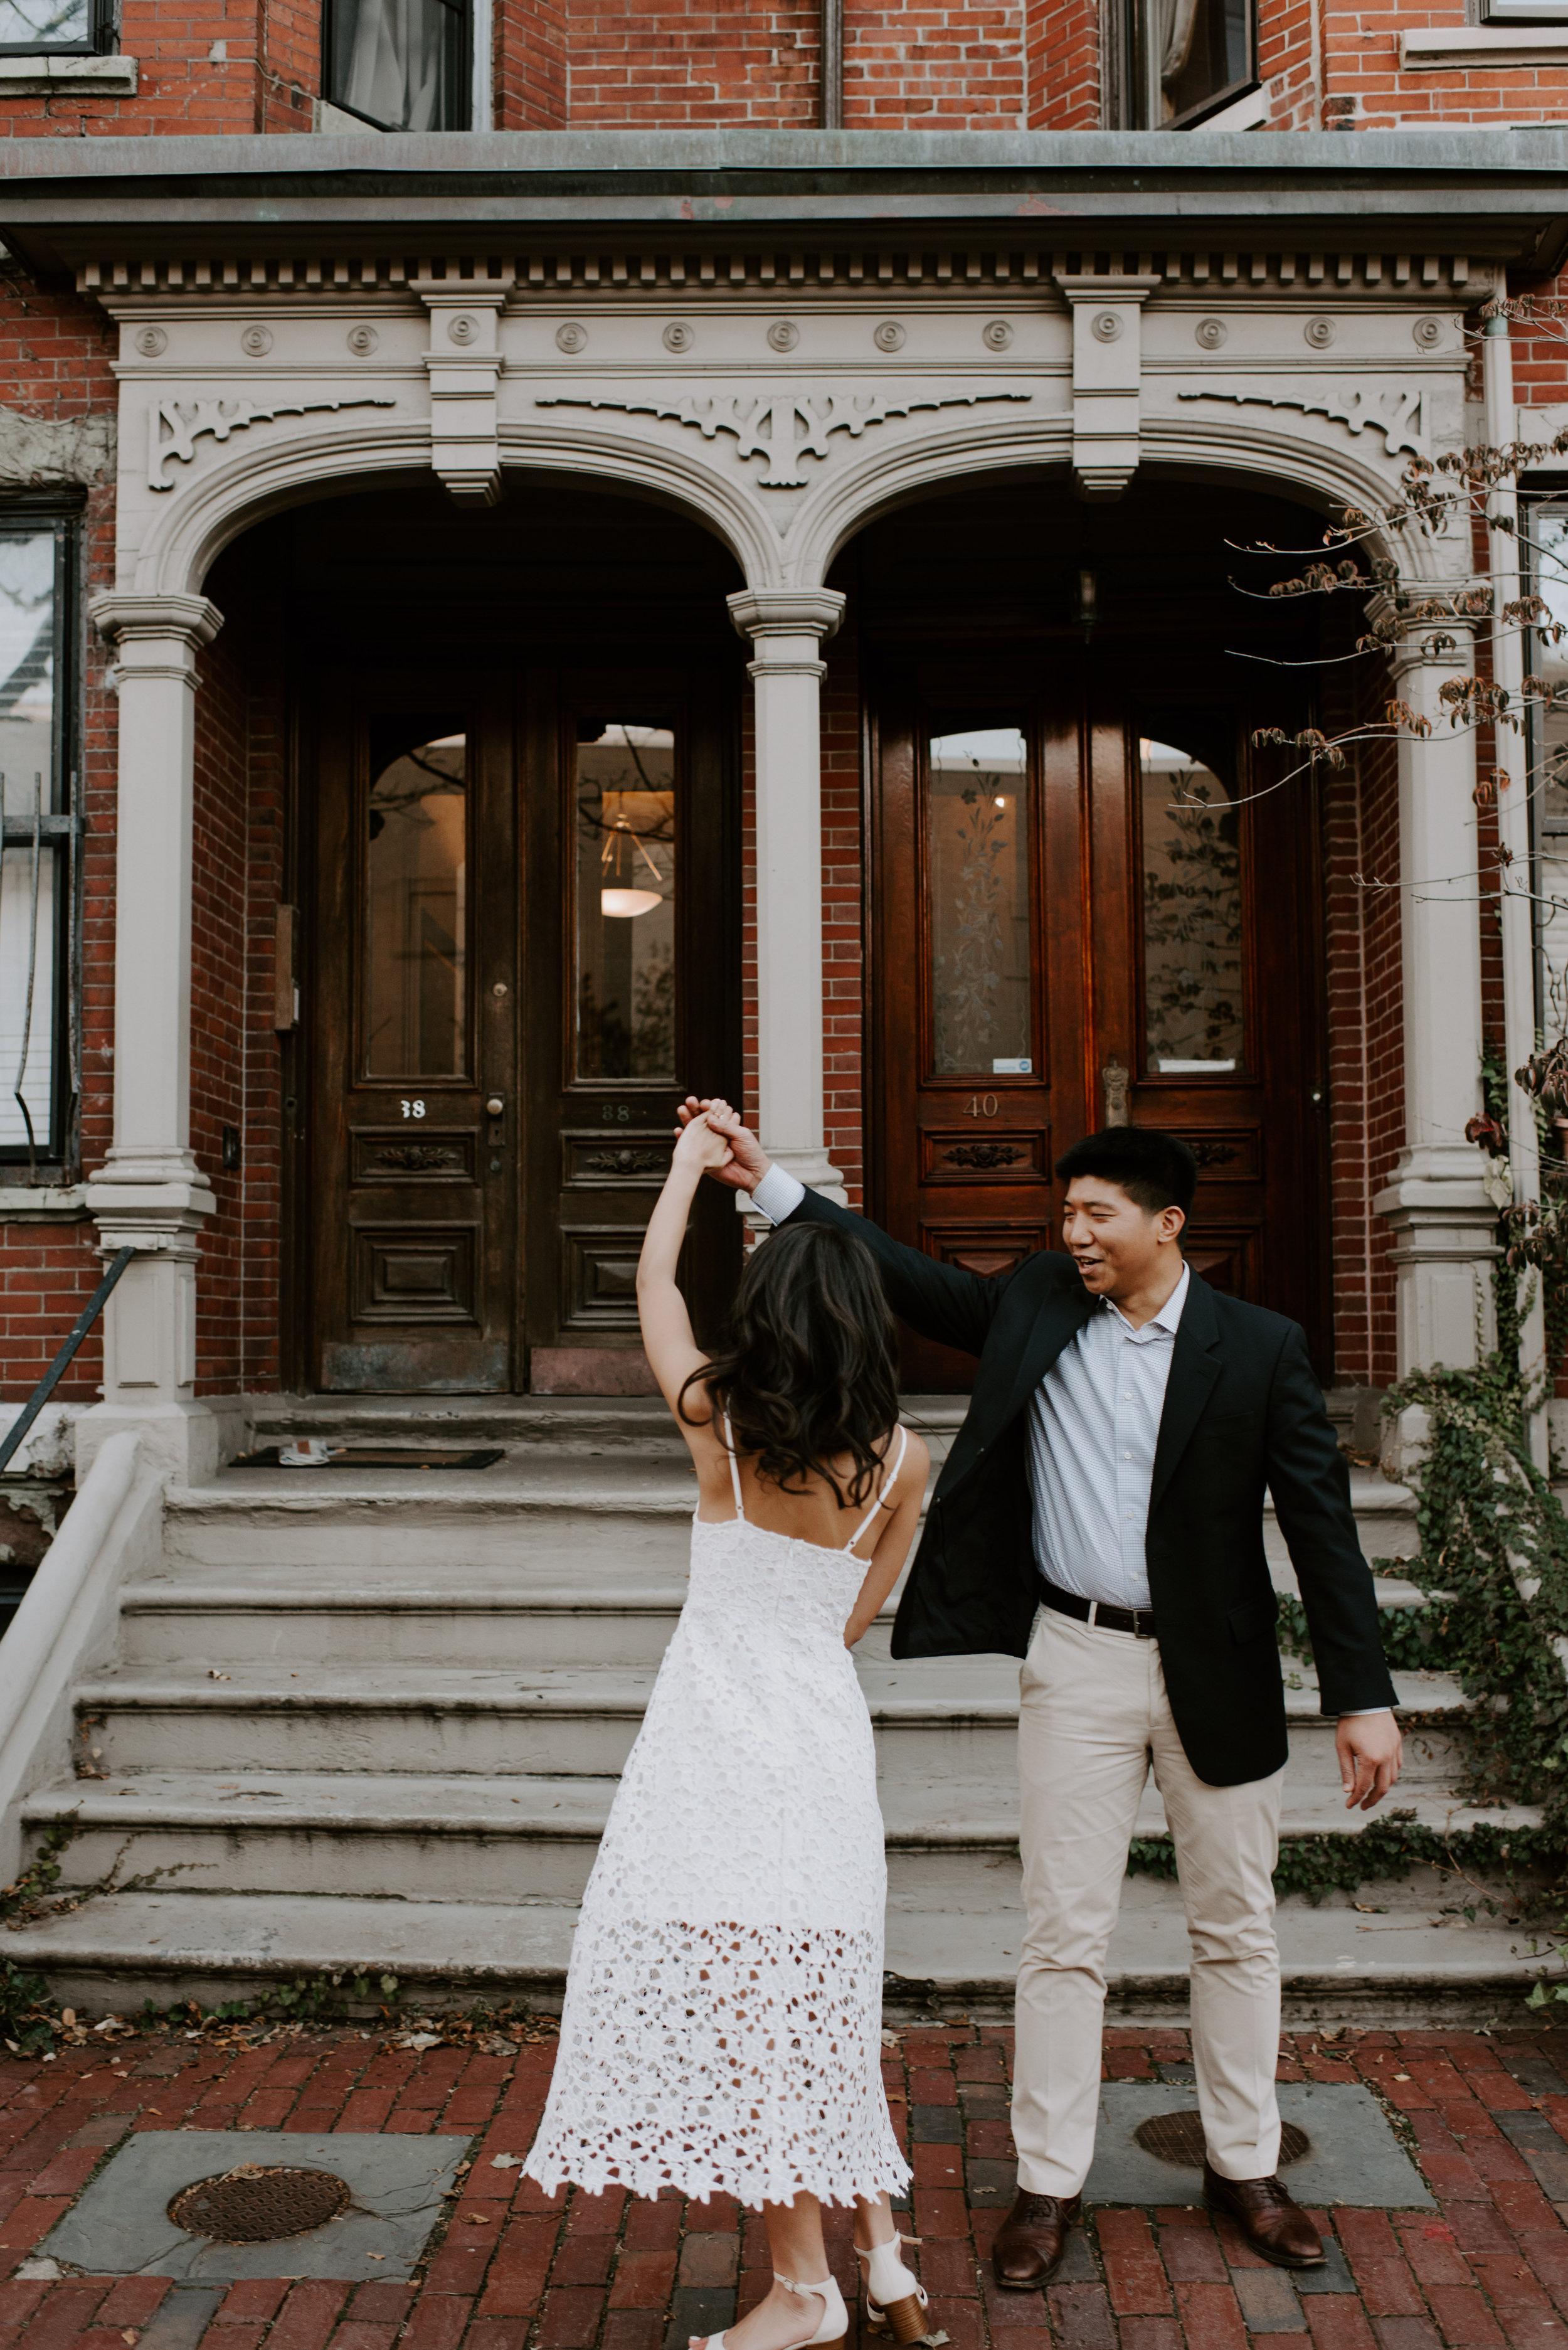 Sam and Thomas's Cozy Boston Engagement Session | Boston Wedding Photographer